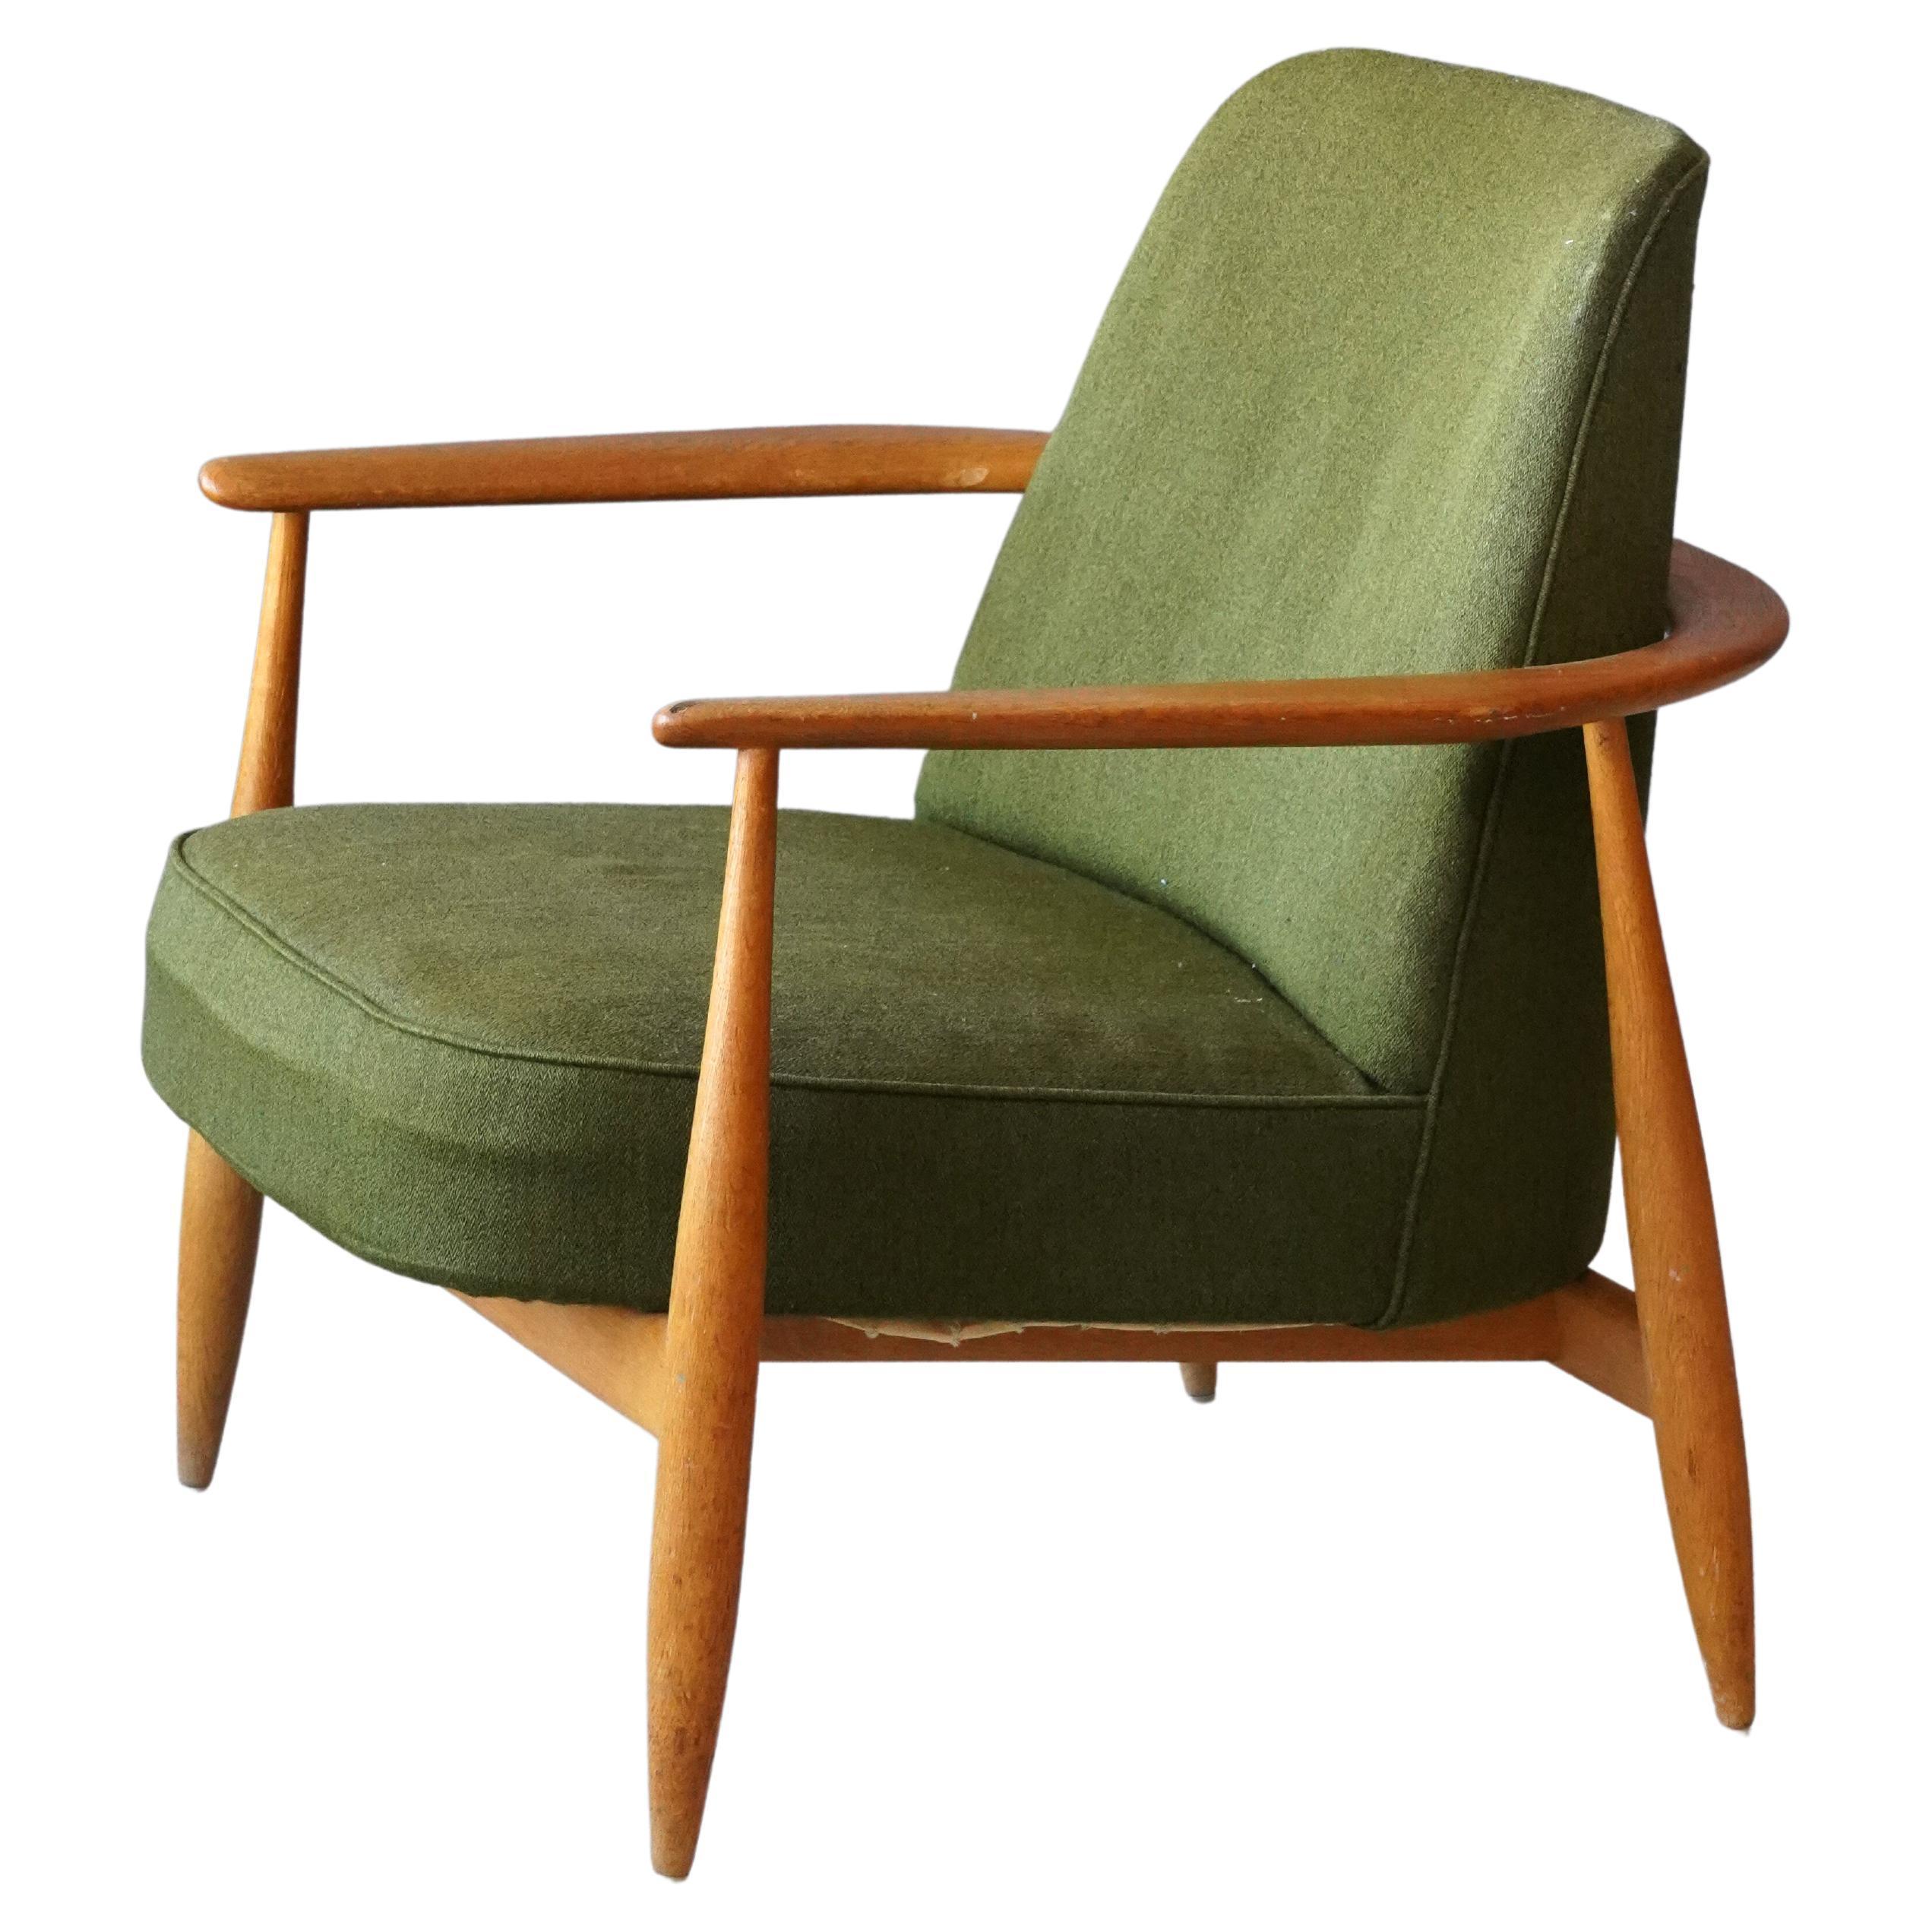 Swedish, Lounge Chair, Turned Oak, Green Fabric, Sweden, 1950s